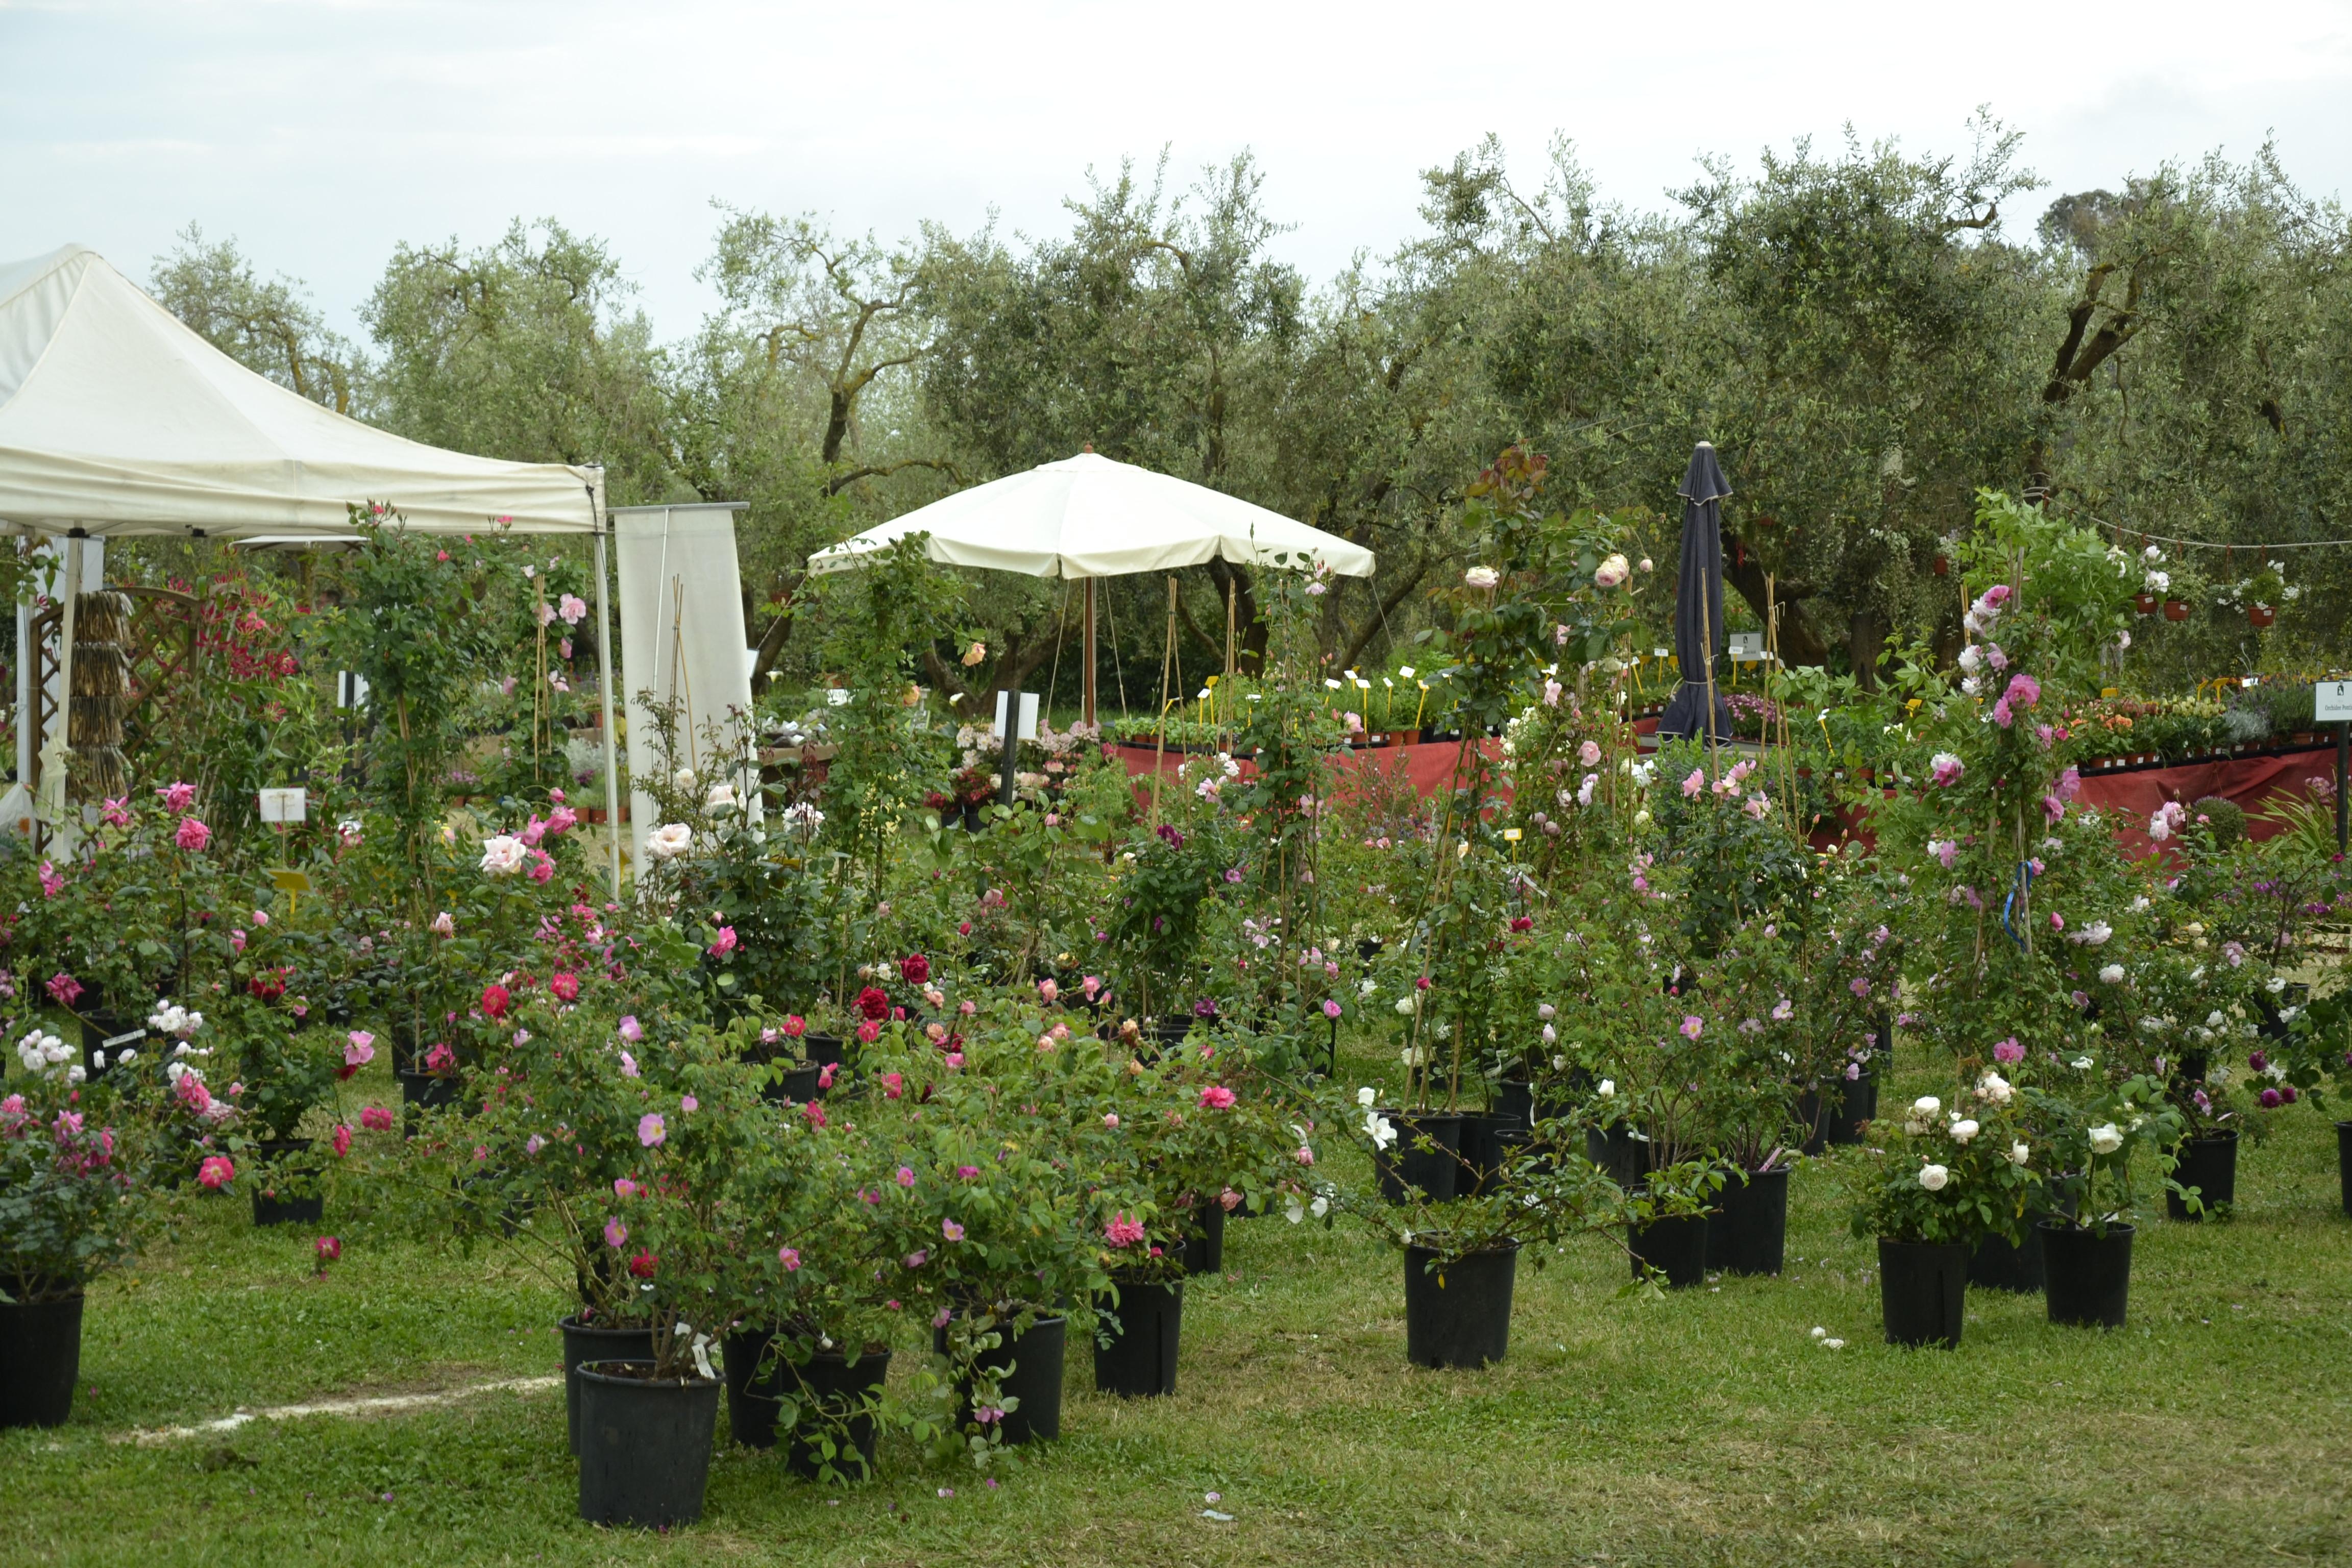 tor san lorenzo « cambiaversoanzio - Giardini E Terrazzi Garden Show Mostra Mercato